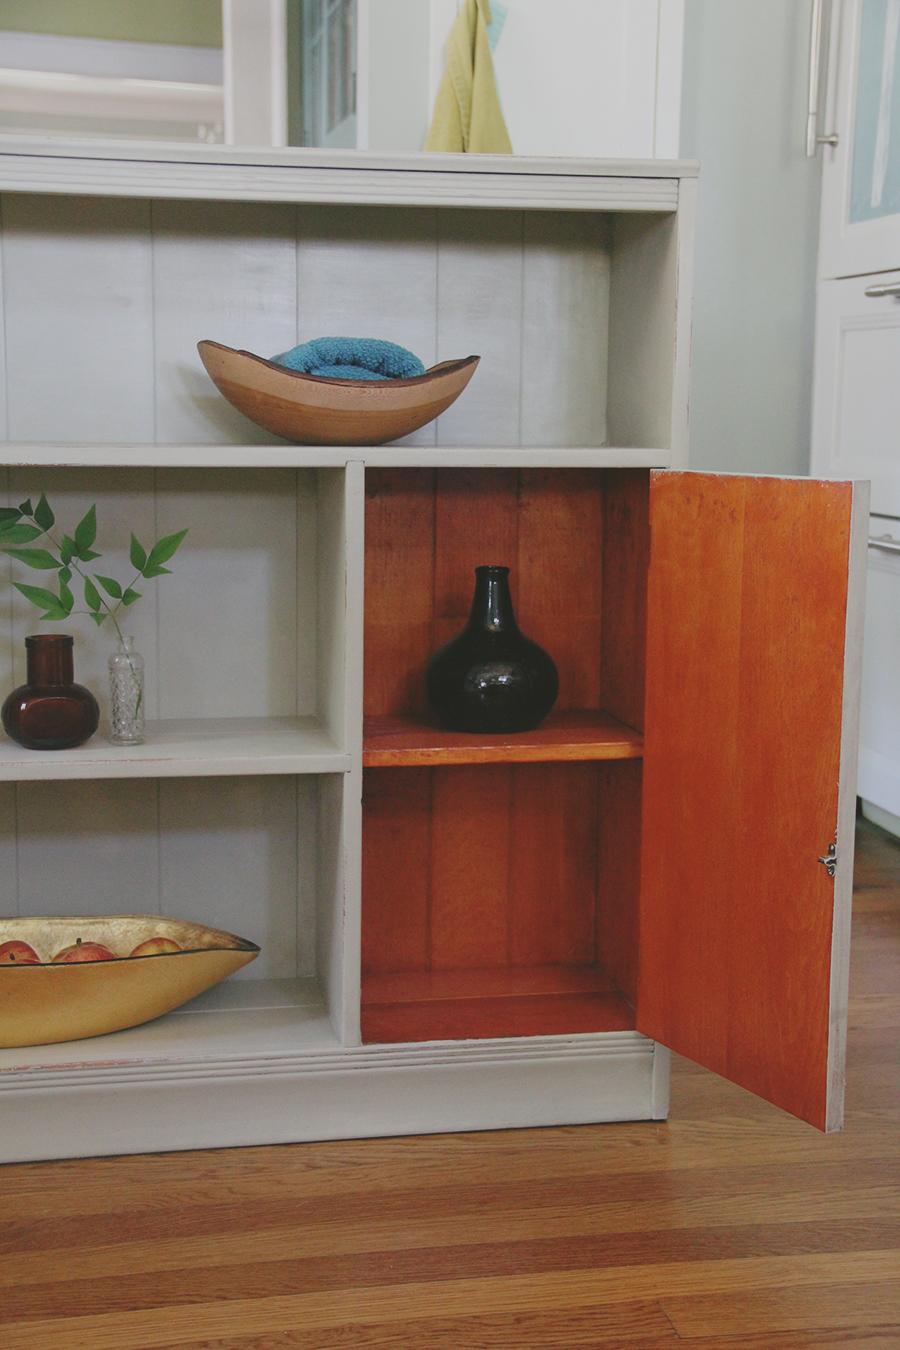 jo-torrijos-a-simpler-design-painted-furniture-21.jpeg